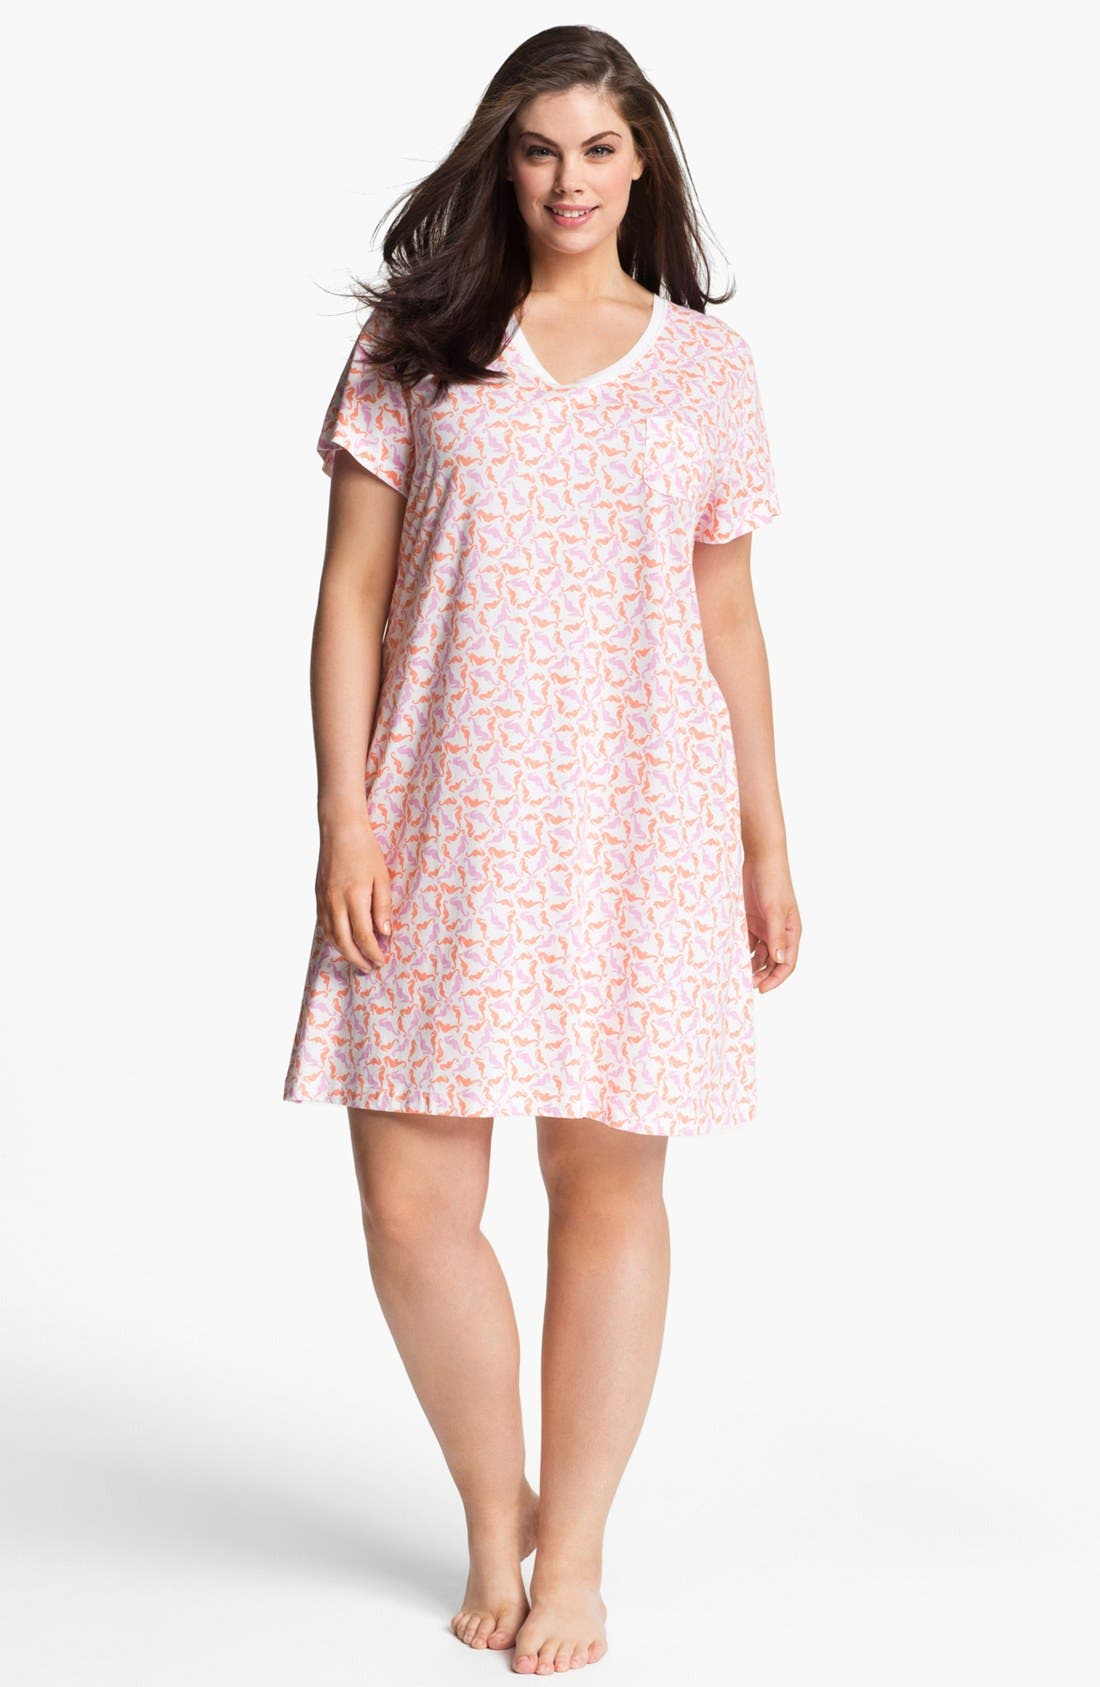 Alternate Image 1 Selected - Carole Hochman Designs Pattern Knit Sleep Shirt (Plus Size)